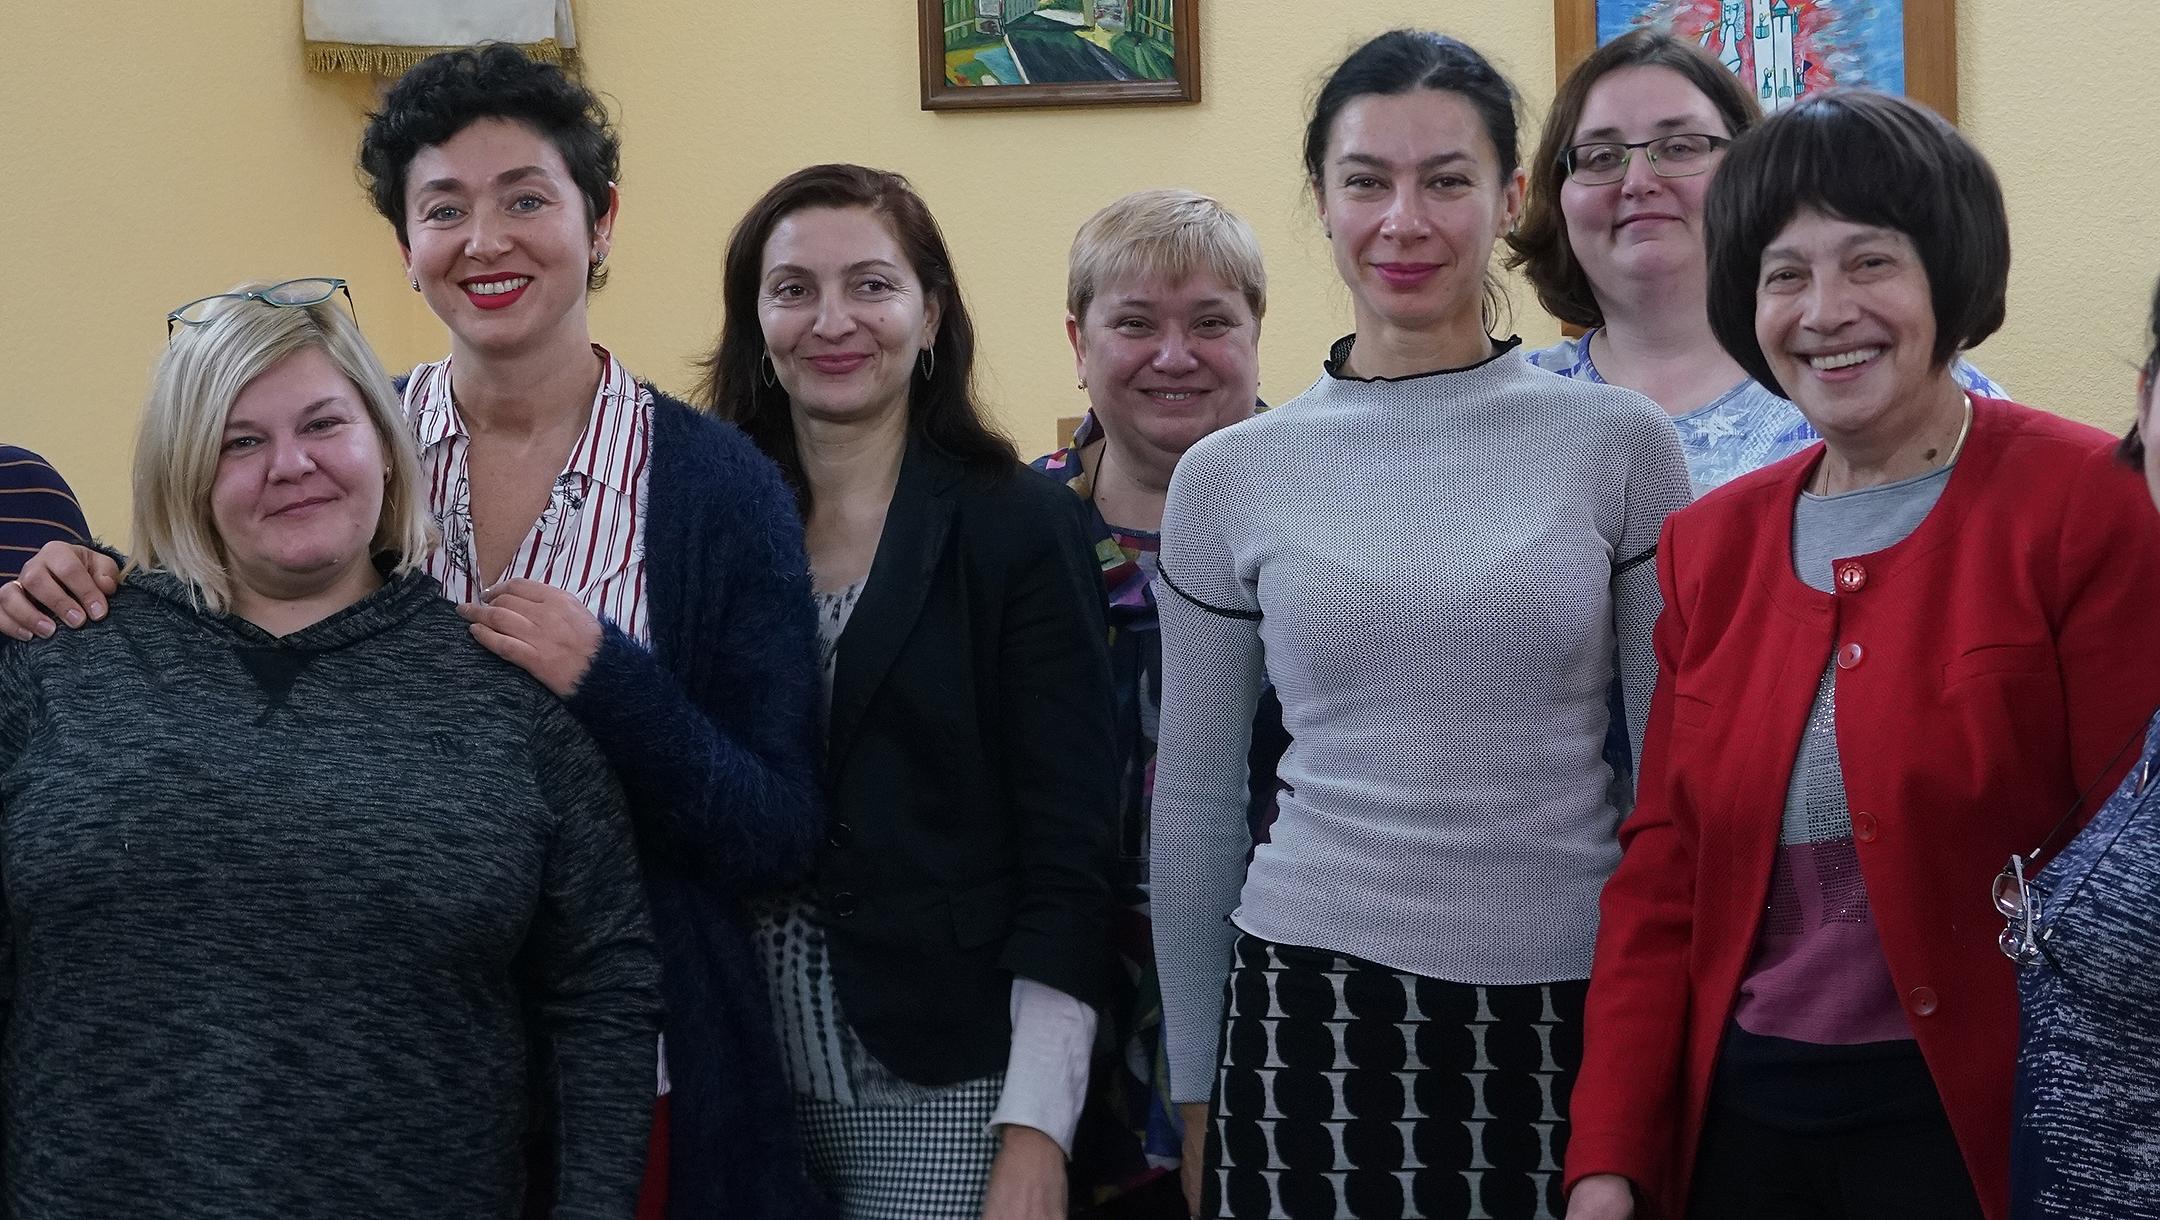 Kira Verkhovskaya, 5th from right, with other Ukrainian Jewish women at the Migdal Jewish Community Center in Odessa on Nov. 3, 2019. (Cnaan Liphshiz)